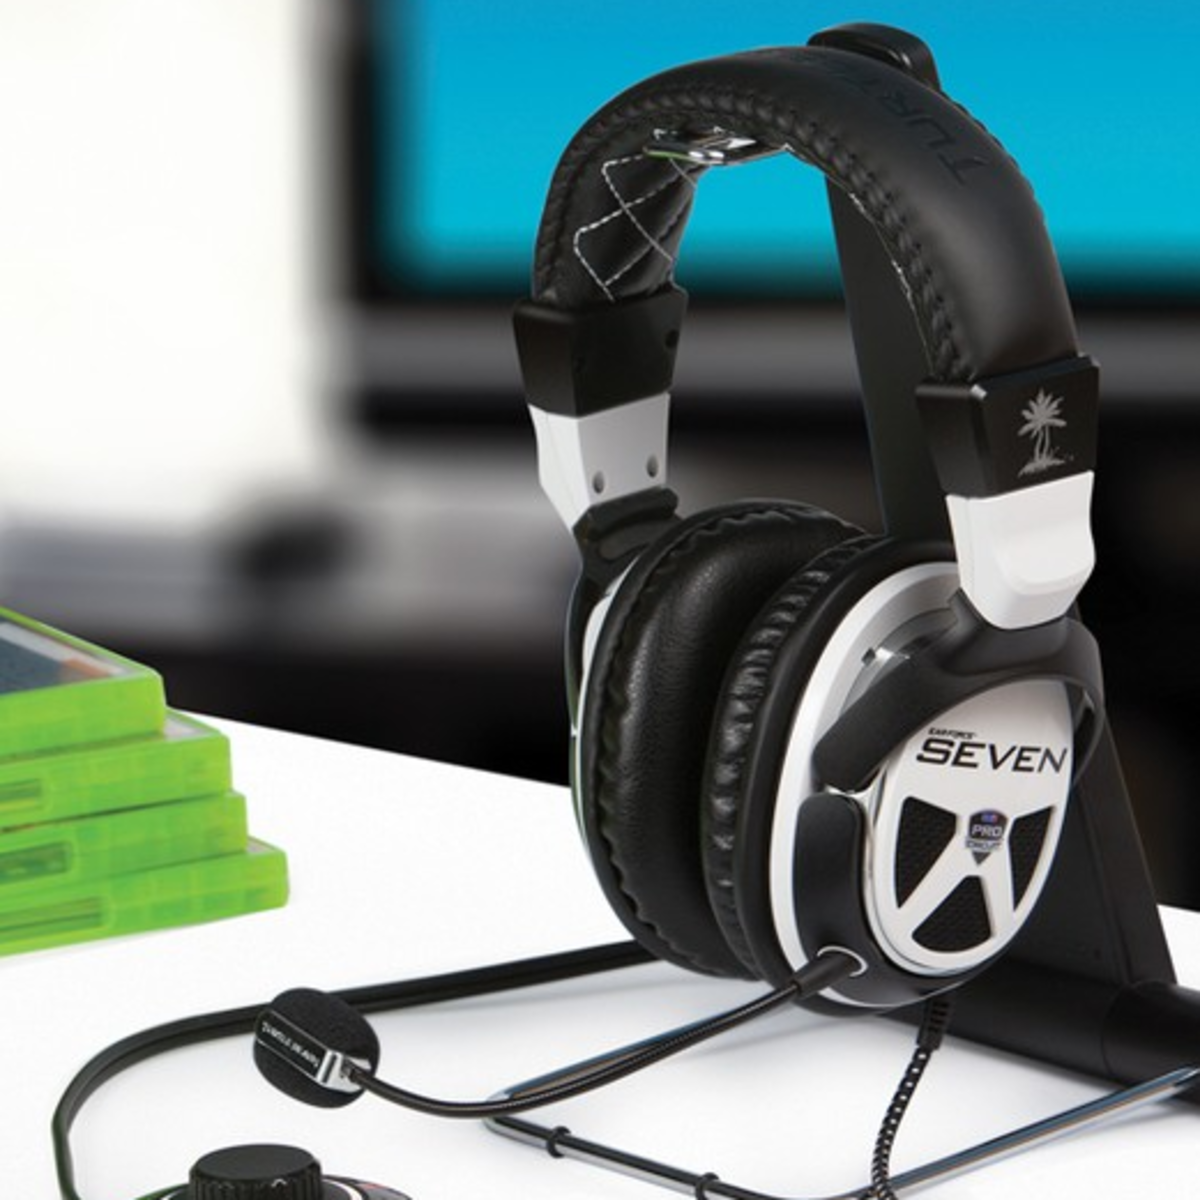 Best FPS PC Gaming Headset/Headphone 2018